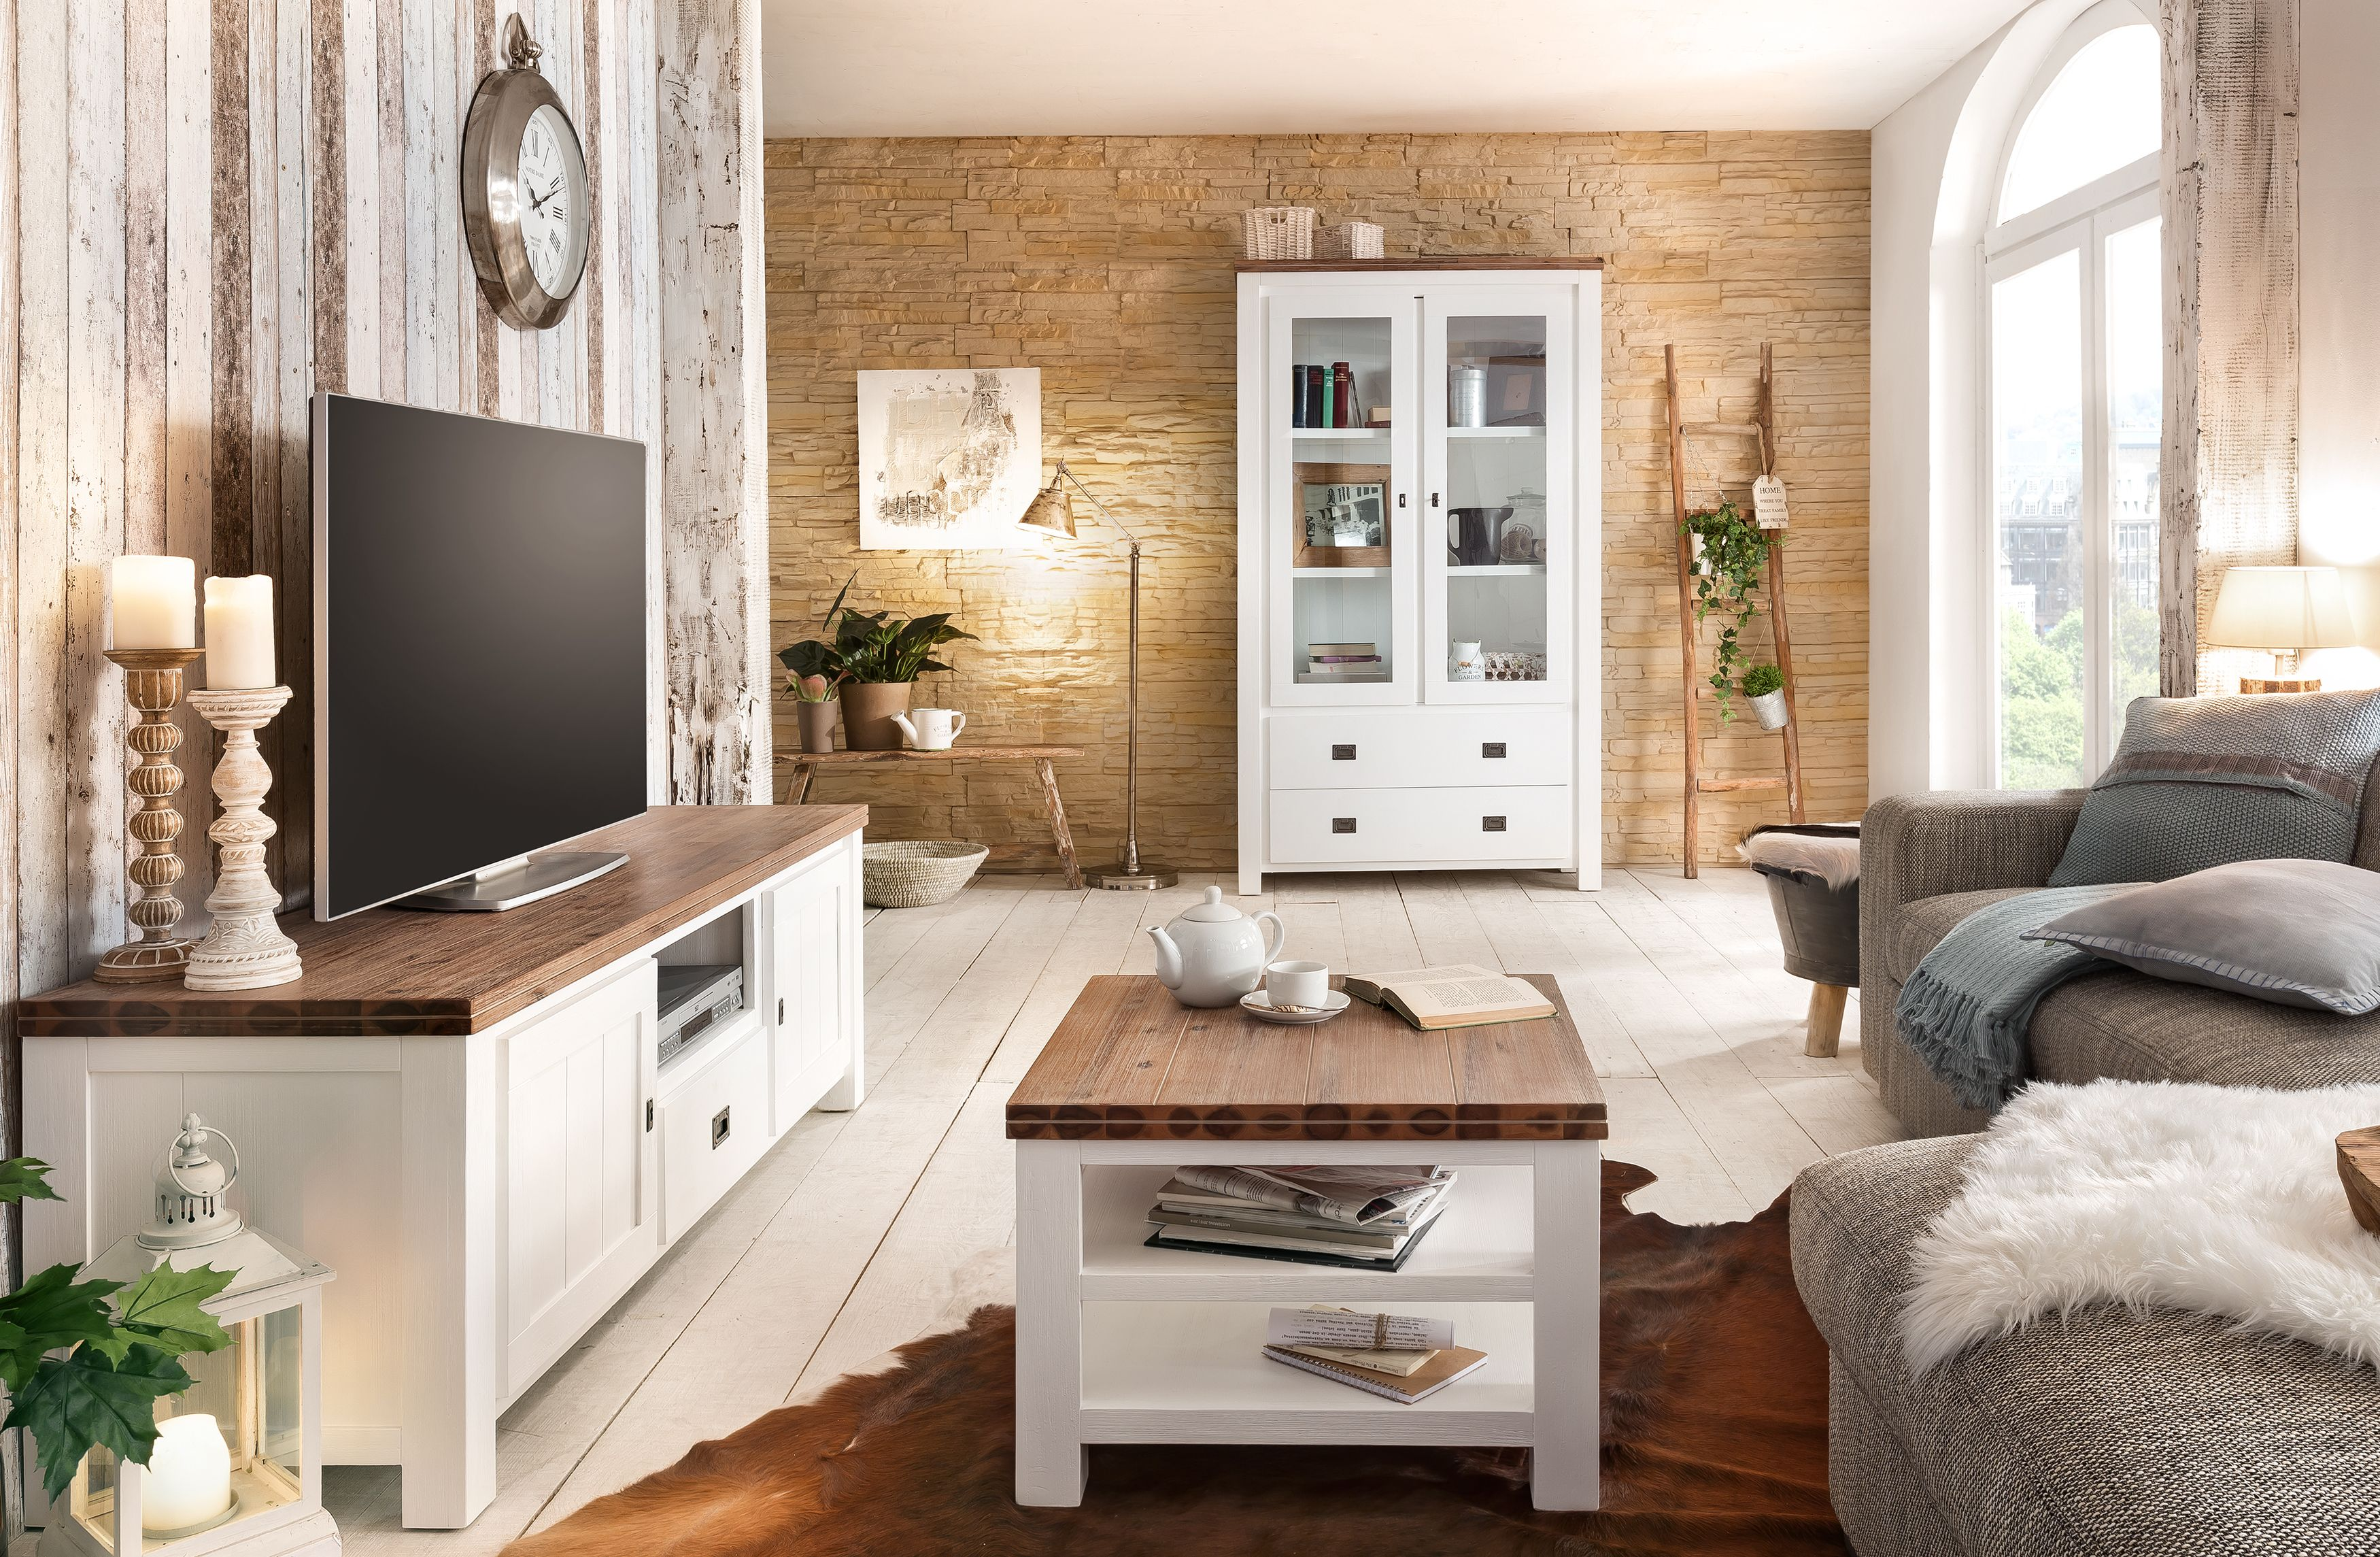 landhaus gardinen zum wohnstuben mobel landhausstil mobel